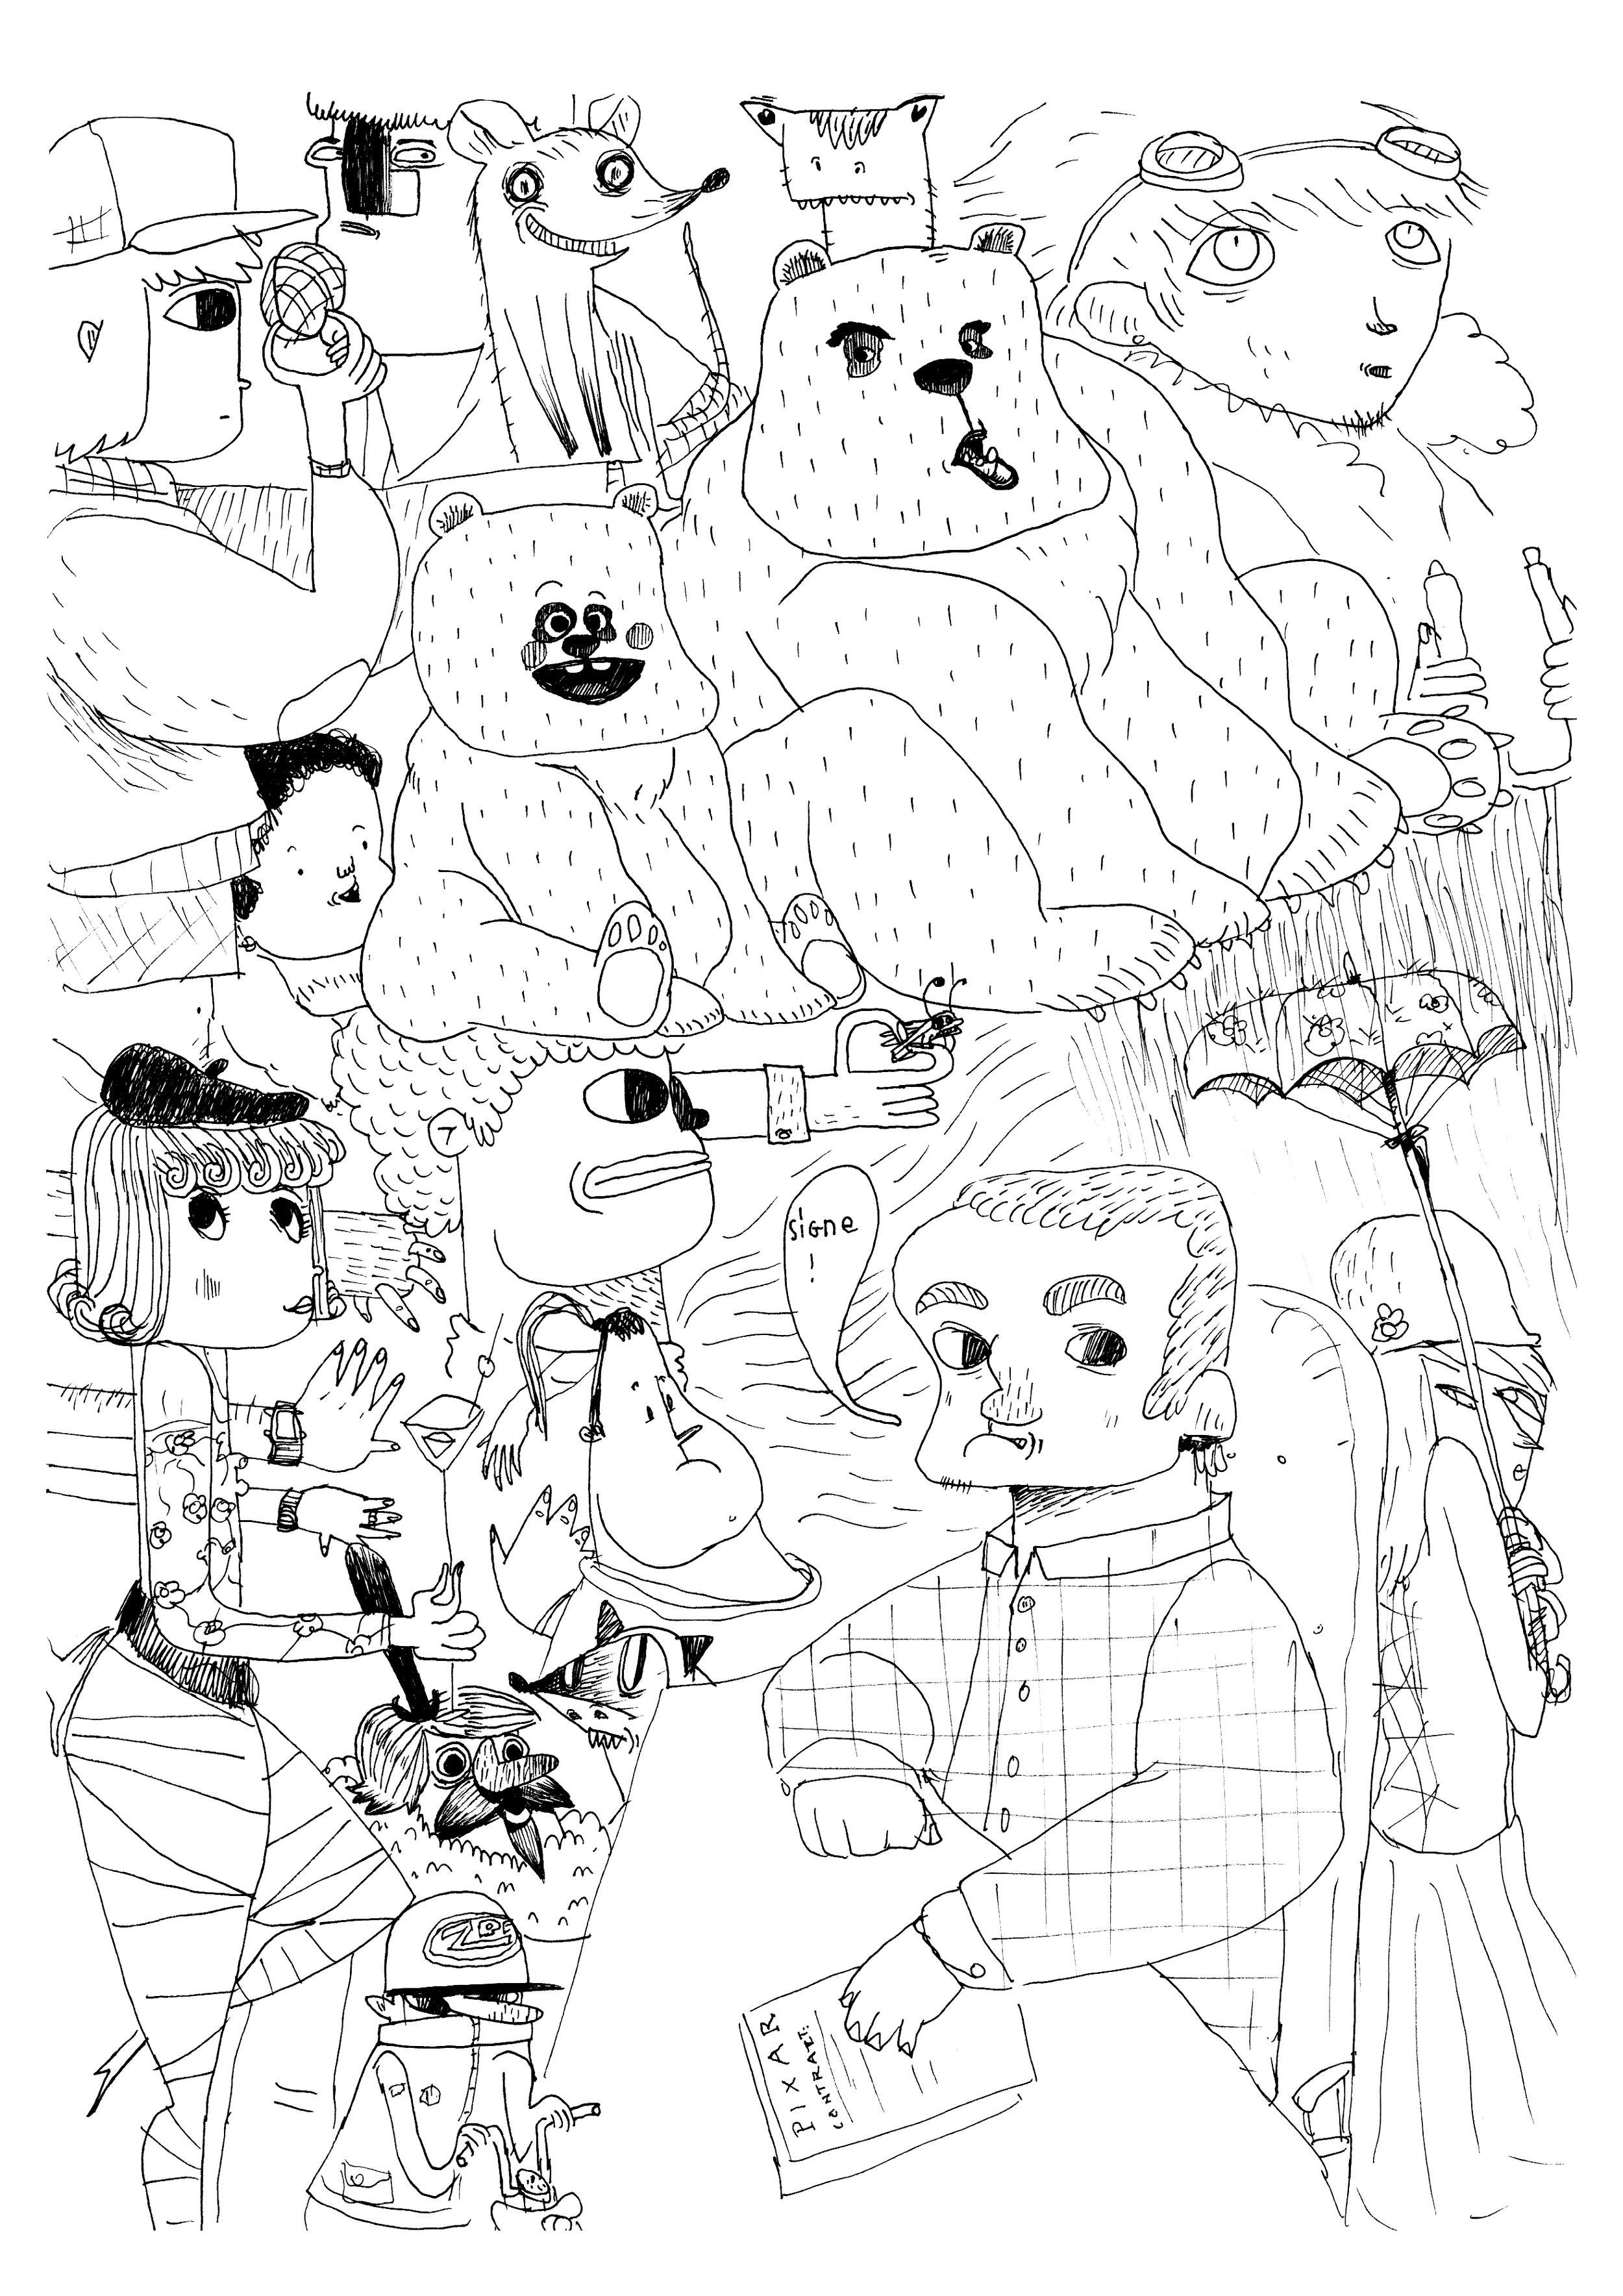 Pascal_Zaffiro_Doodle_20.jpg